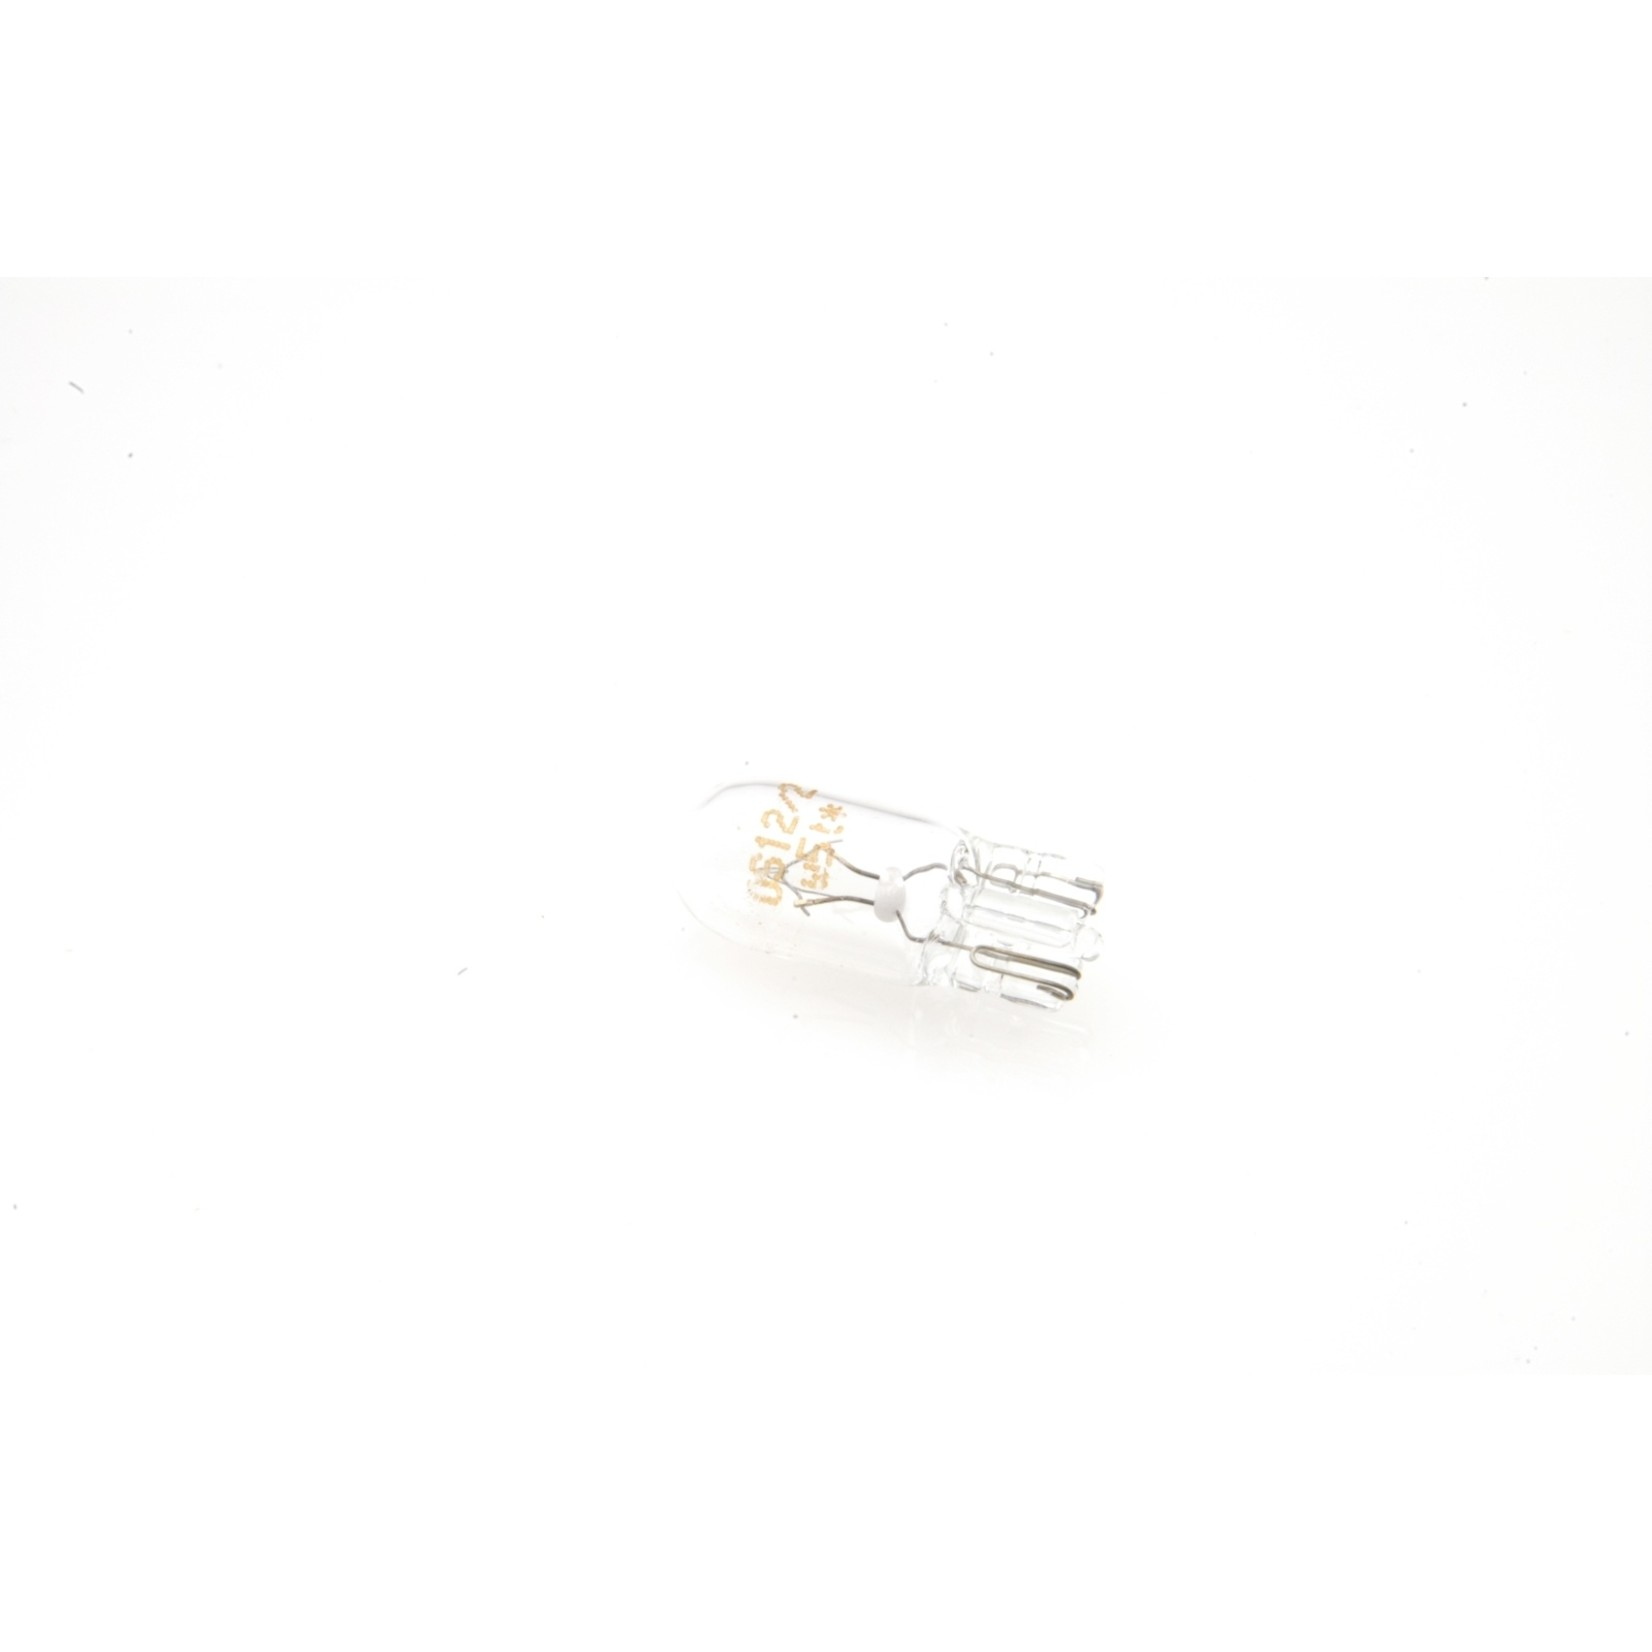 Dashbordlamp 07/72- 12V - 2W Nr Org: ZC9614682